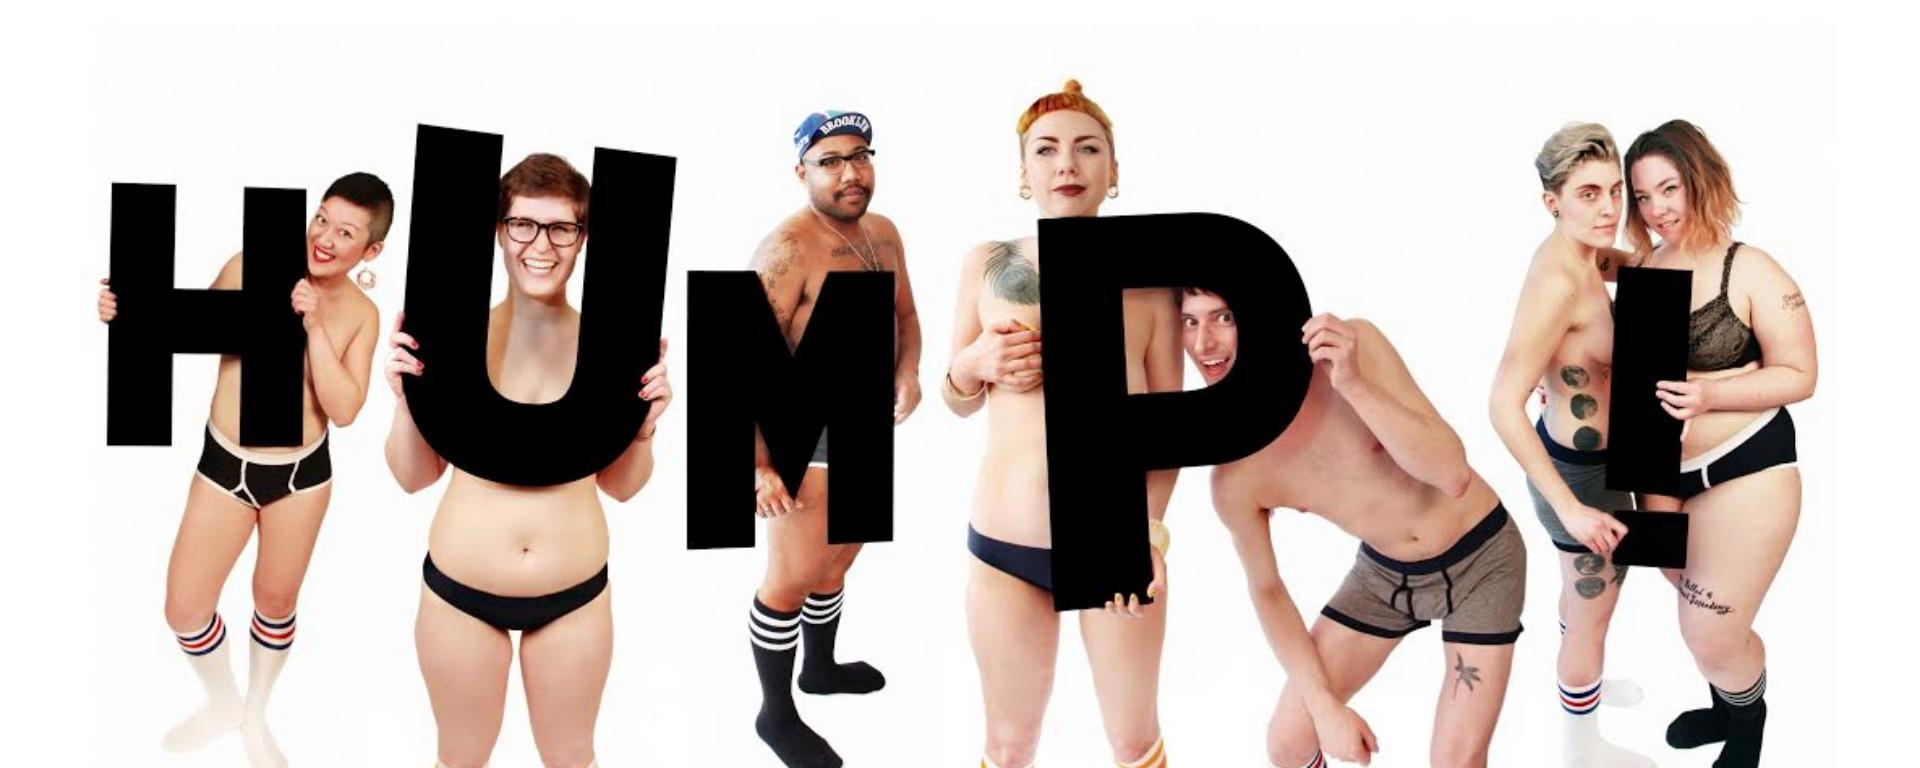 Porn tube amateur threesome-6423